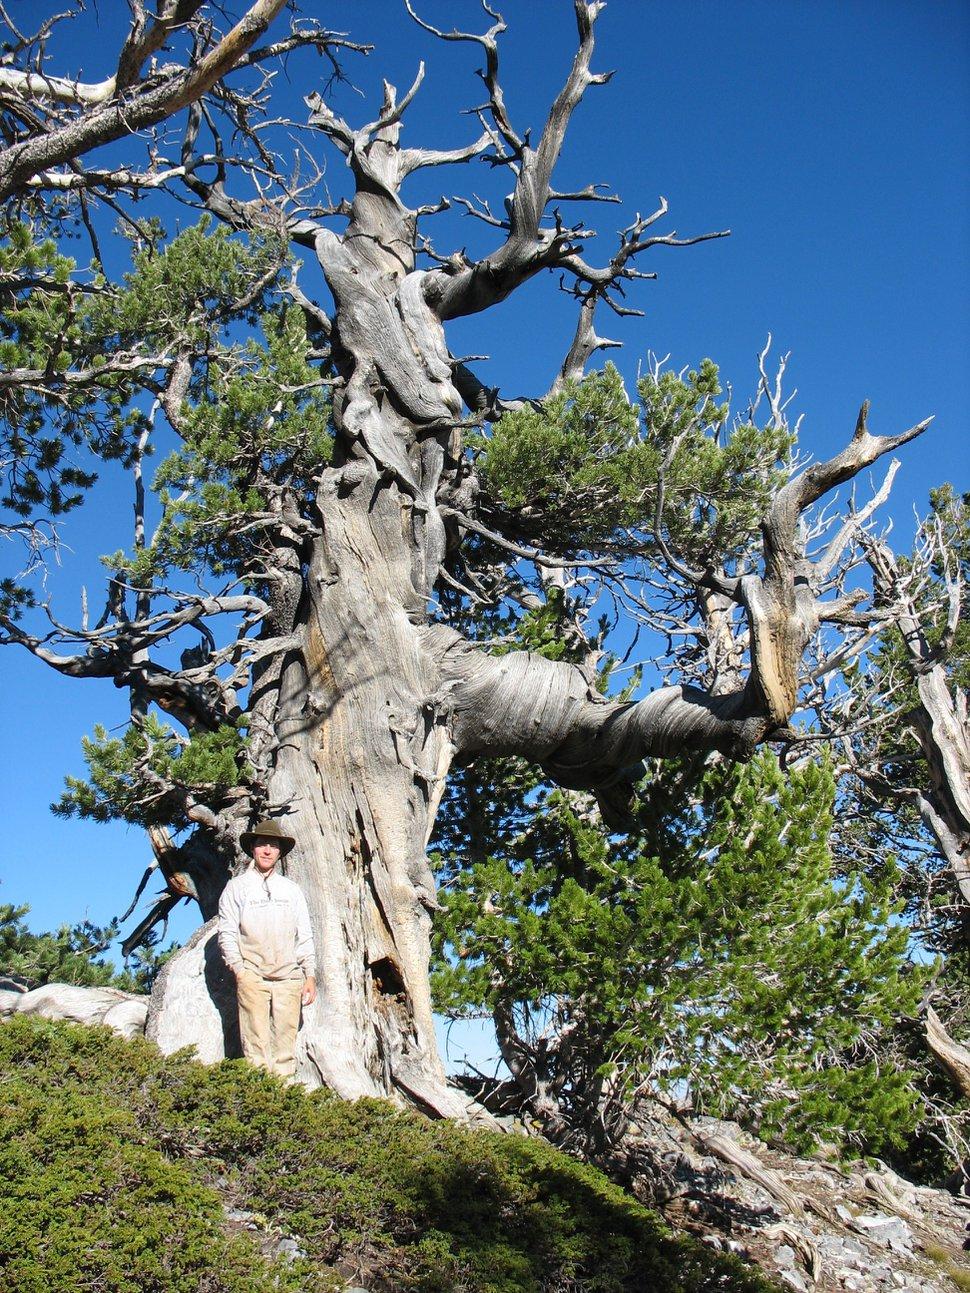 (Photo courtesy of Matt Bekker, Brigham Young University) Limber pine in American Fork Canyon.